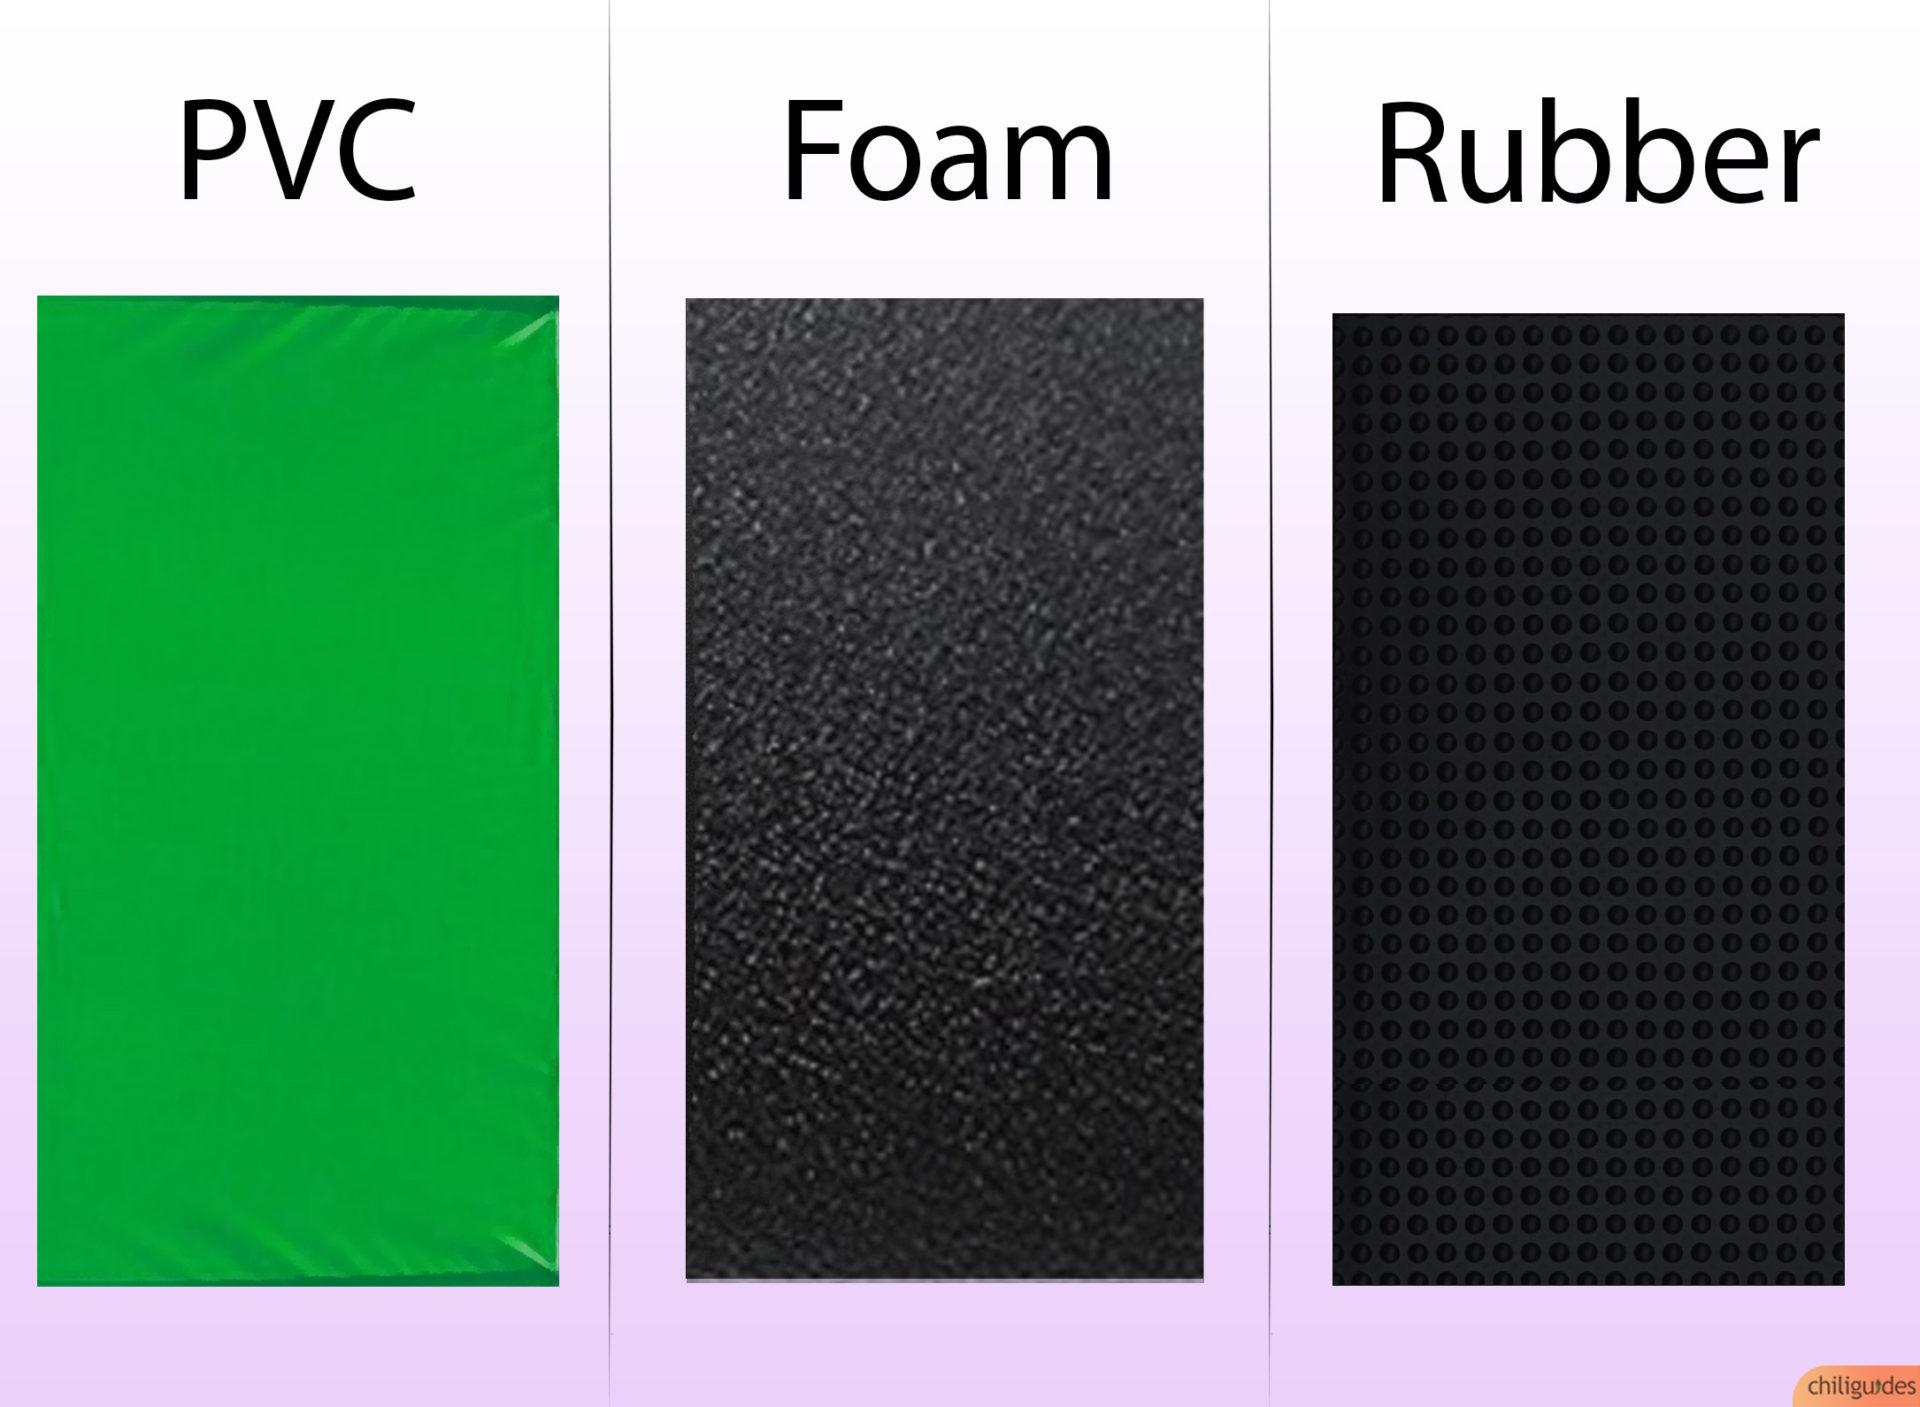 PVC vs. Rubber vs. Foam